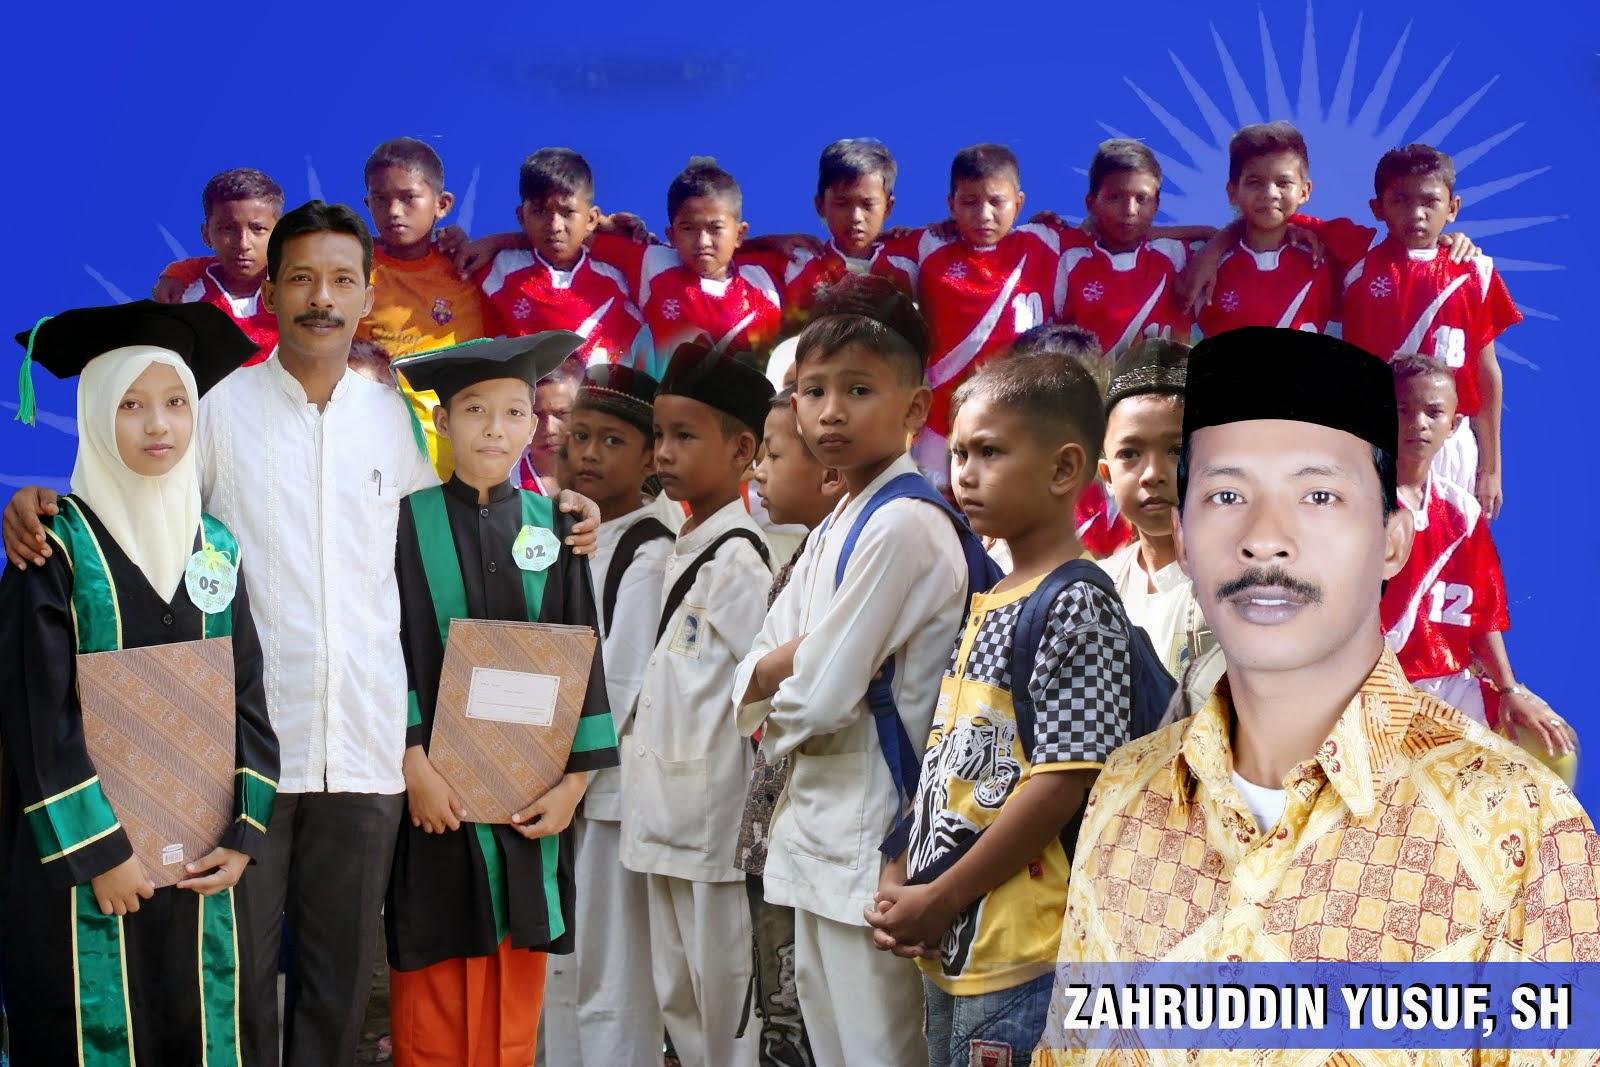 Zahruddin Yusuf, SH